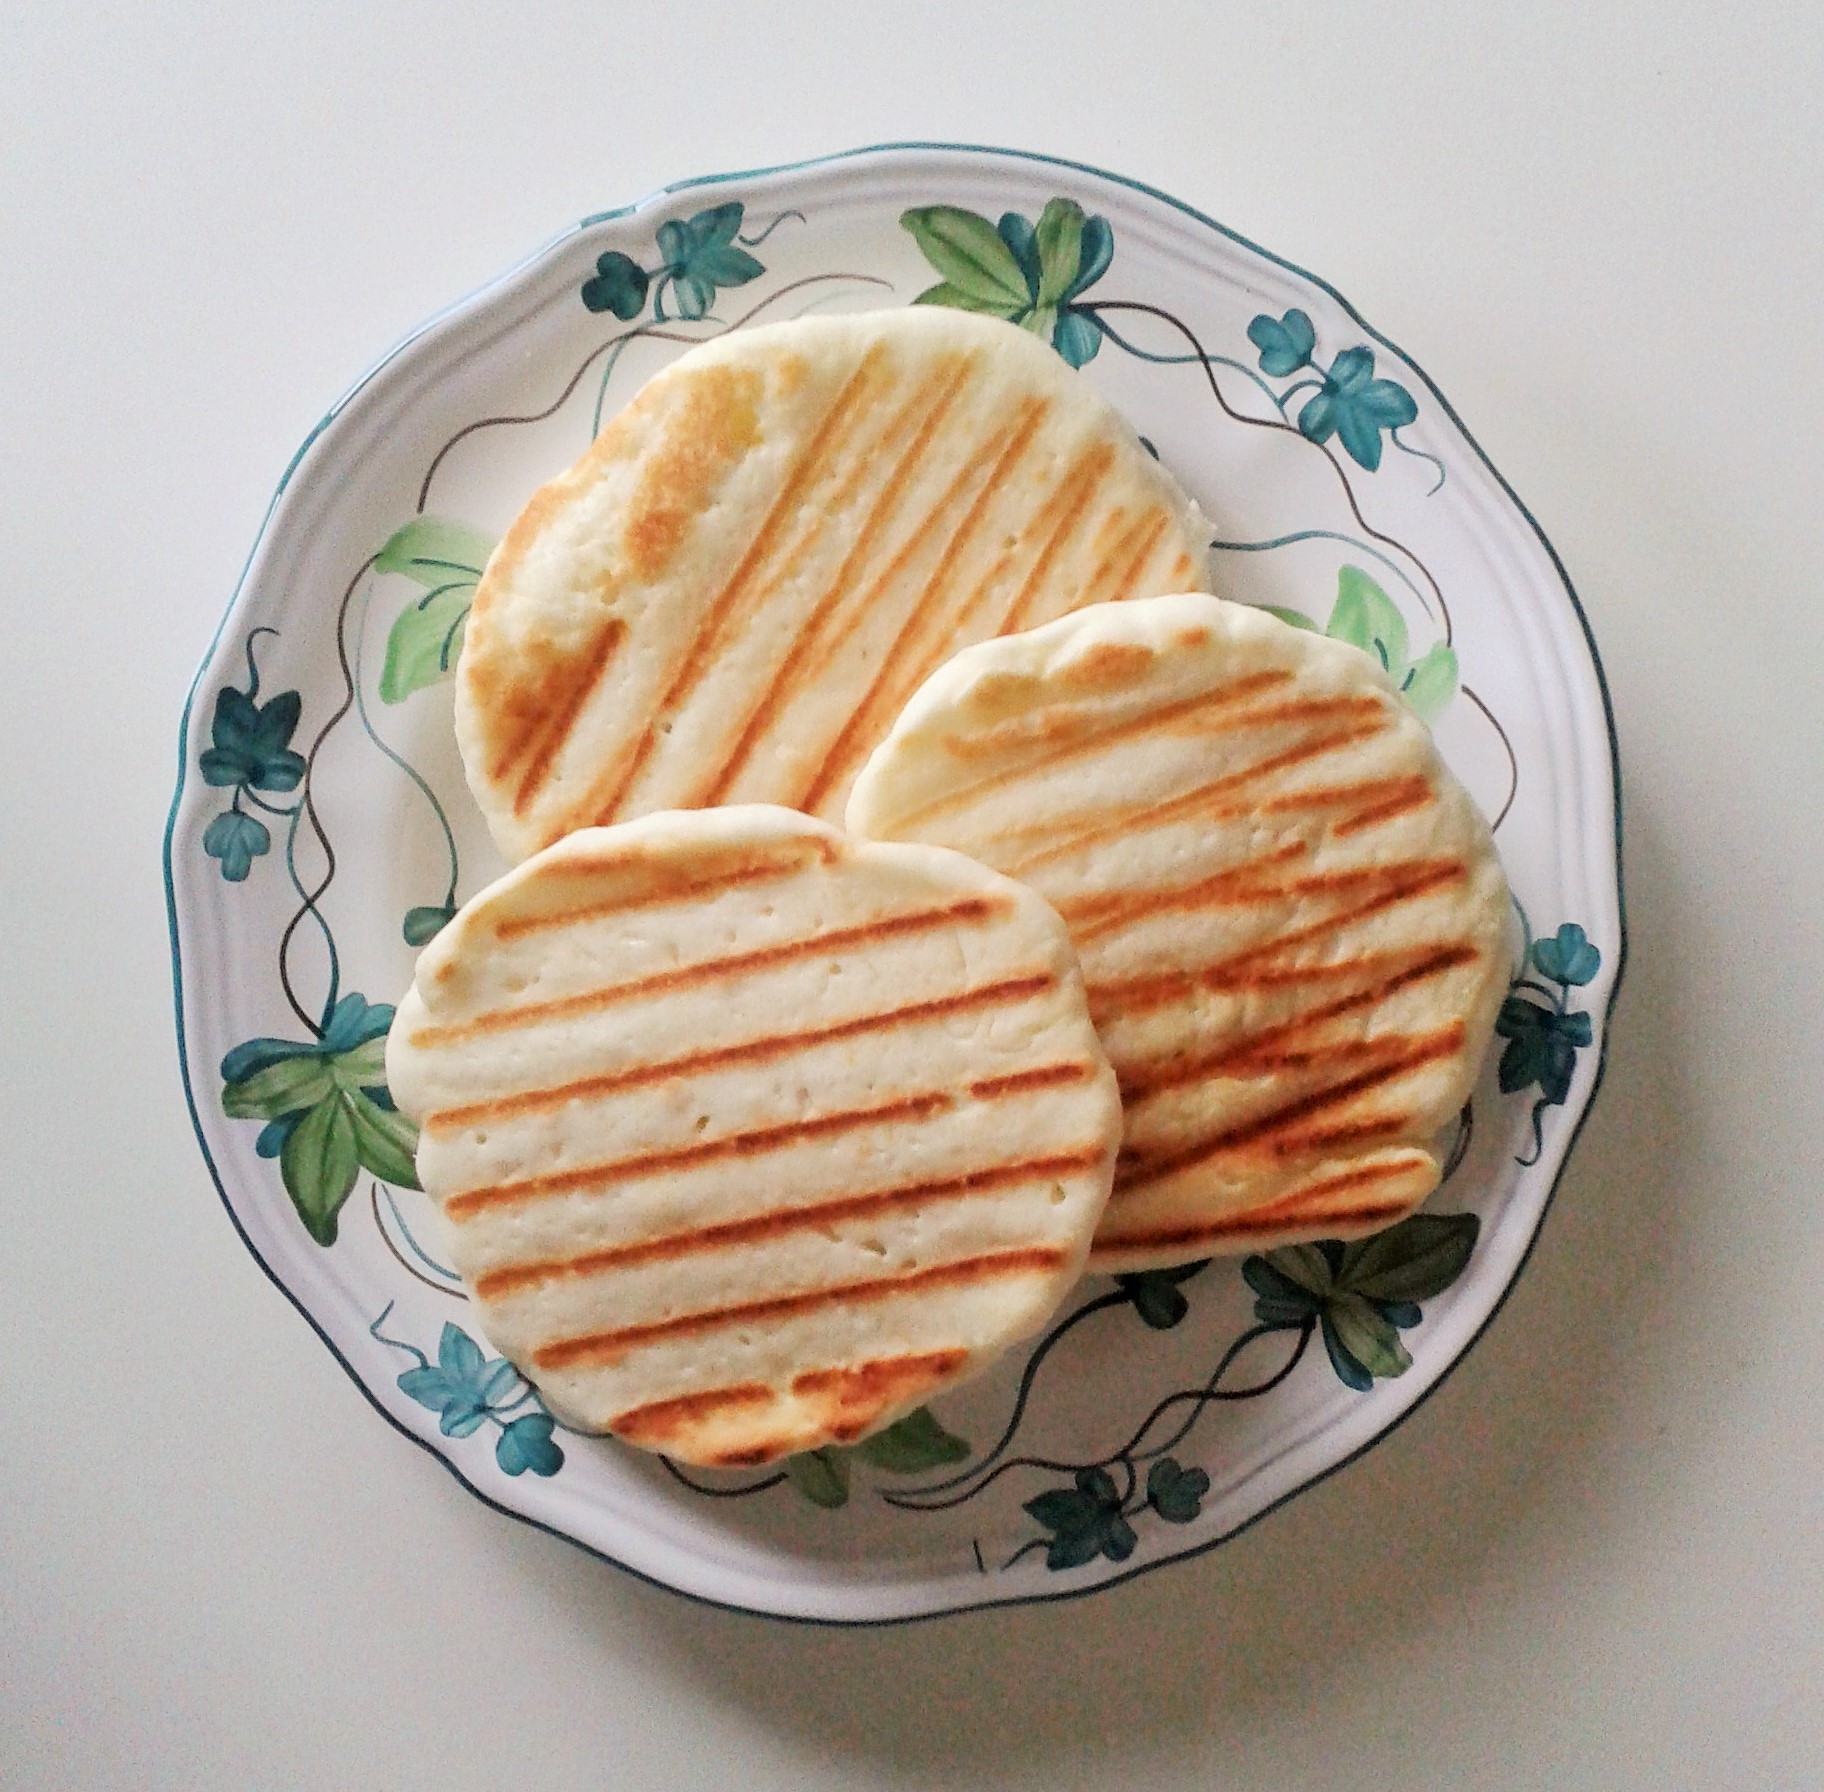 Cucinare senza glutine focaccine rapidissime a casa di bianca - Cucinare a casa ...